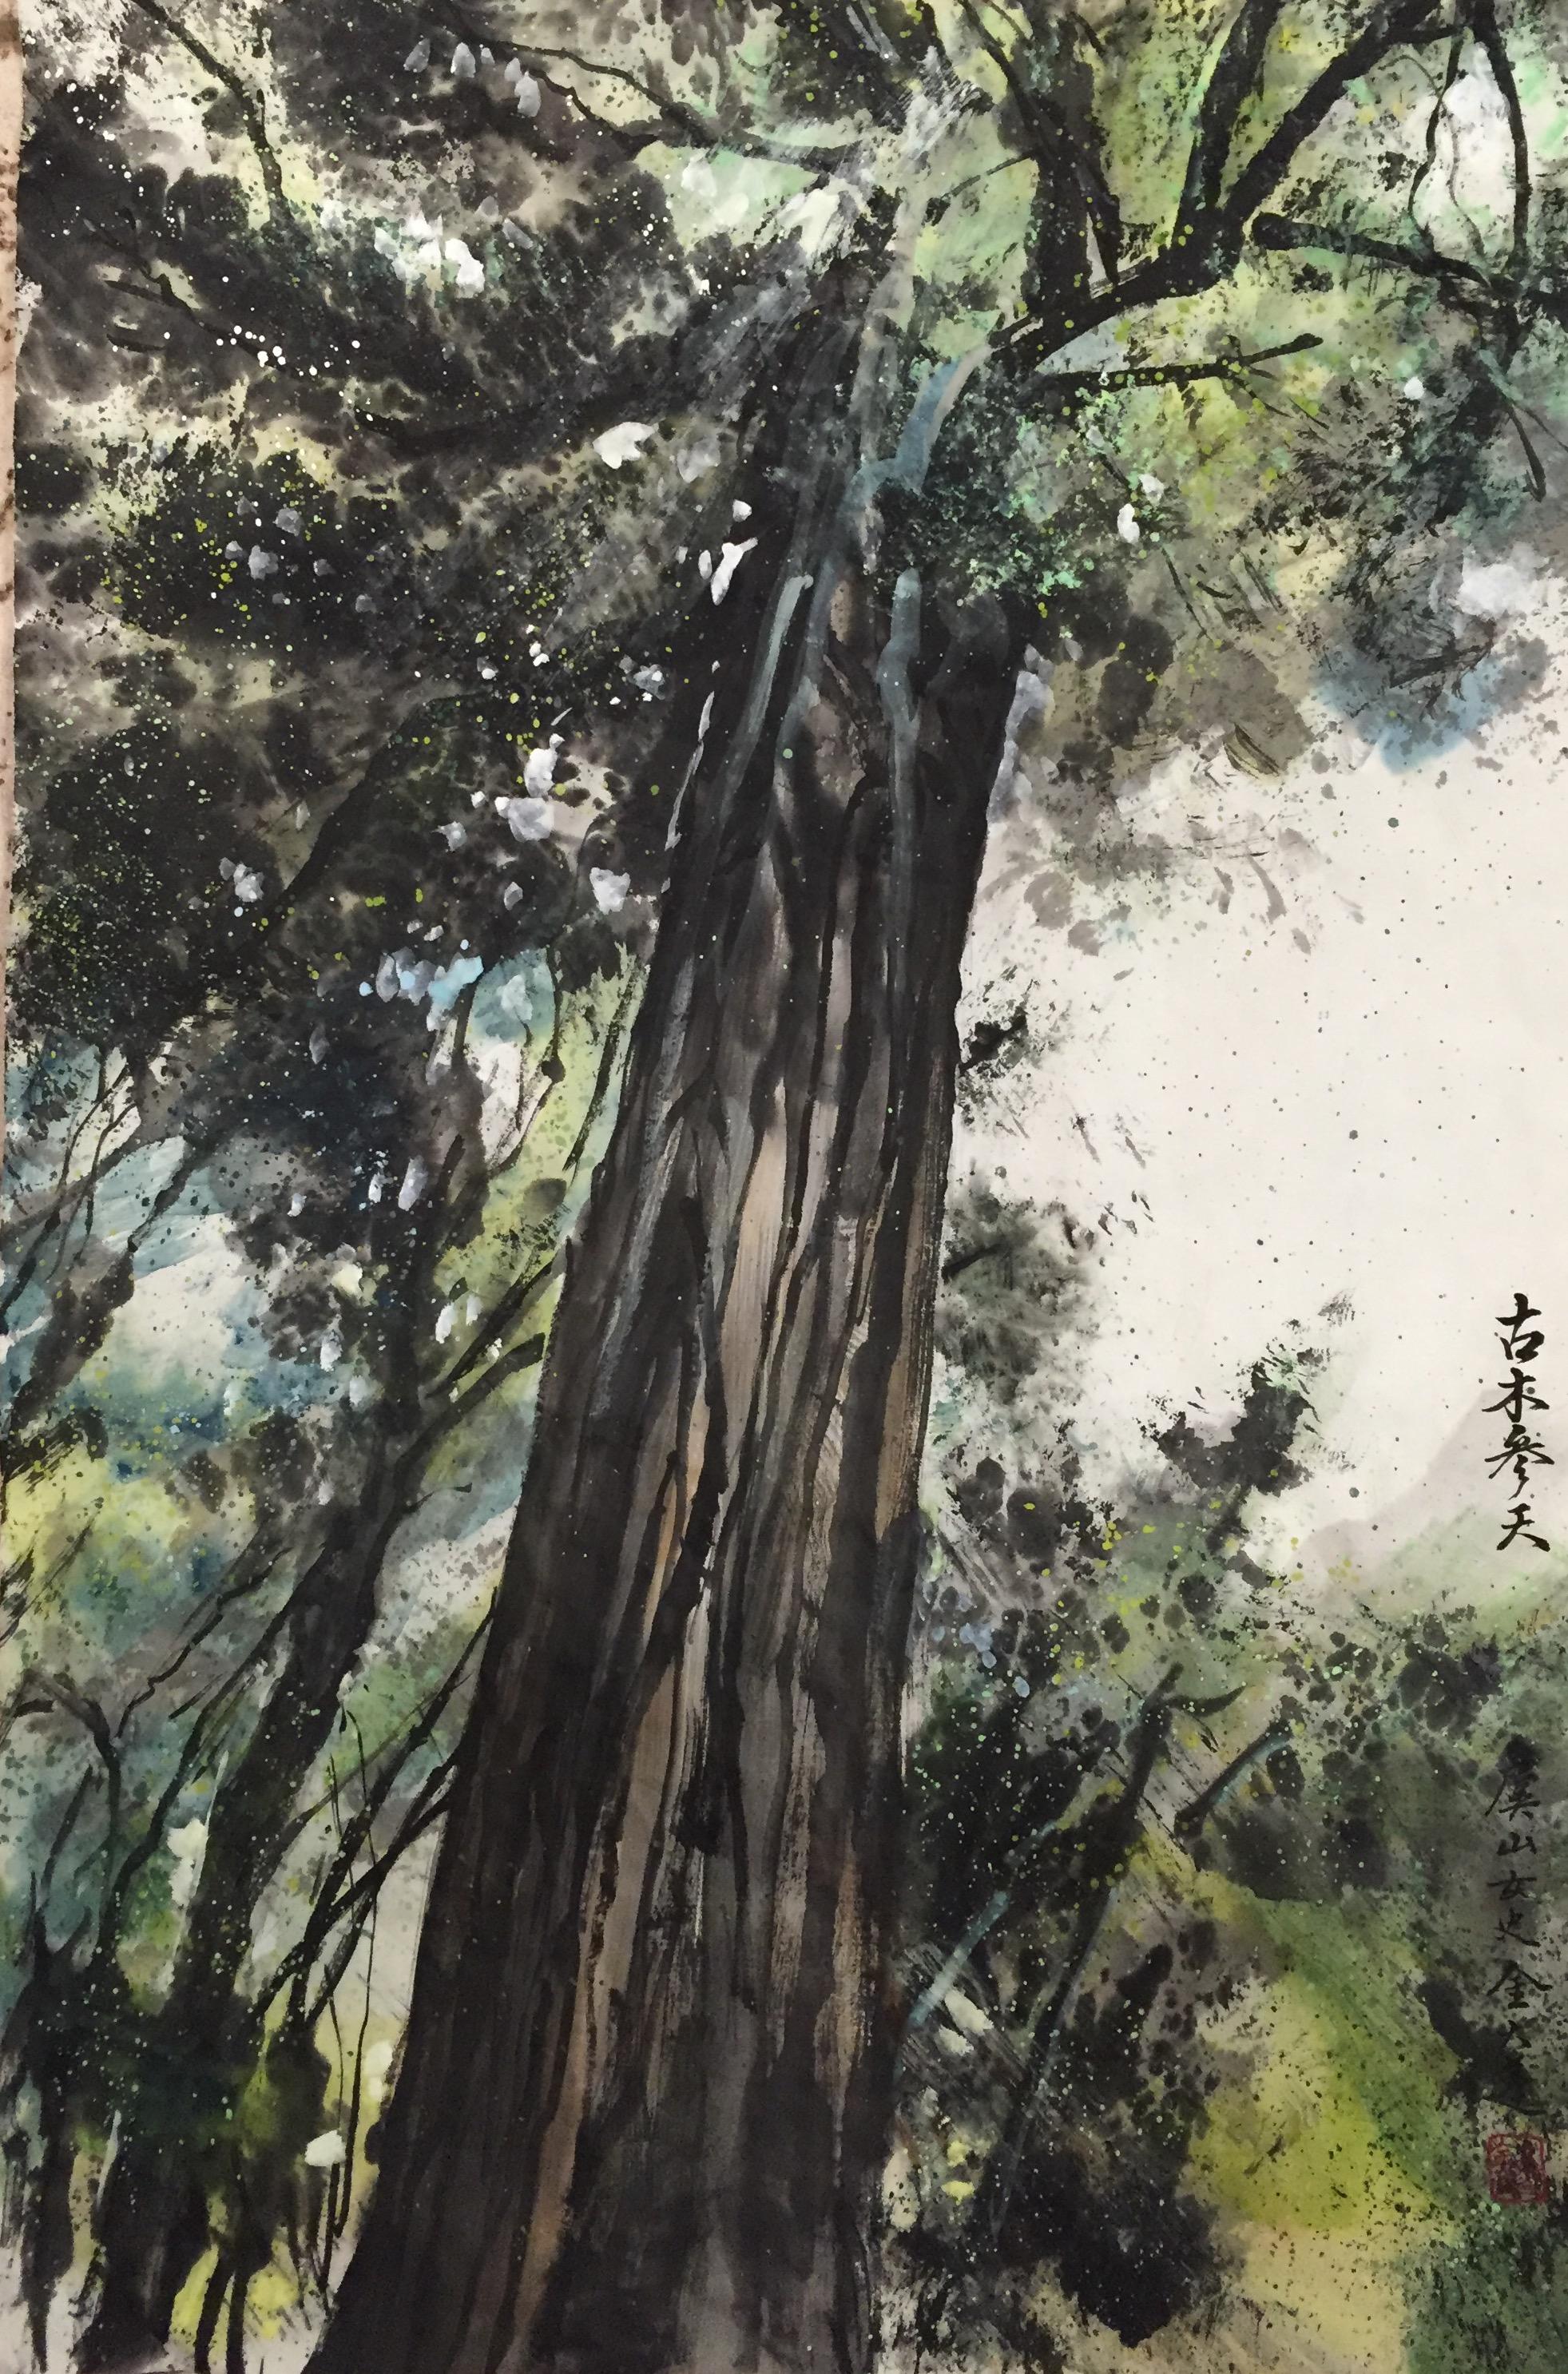 Old Redwood trees in Big Sur